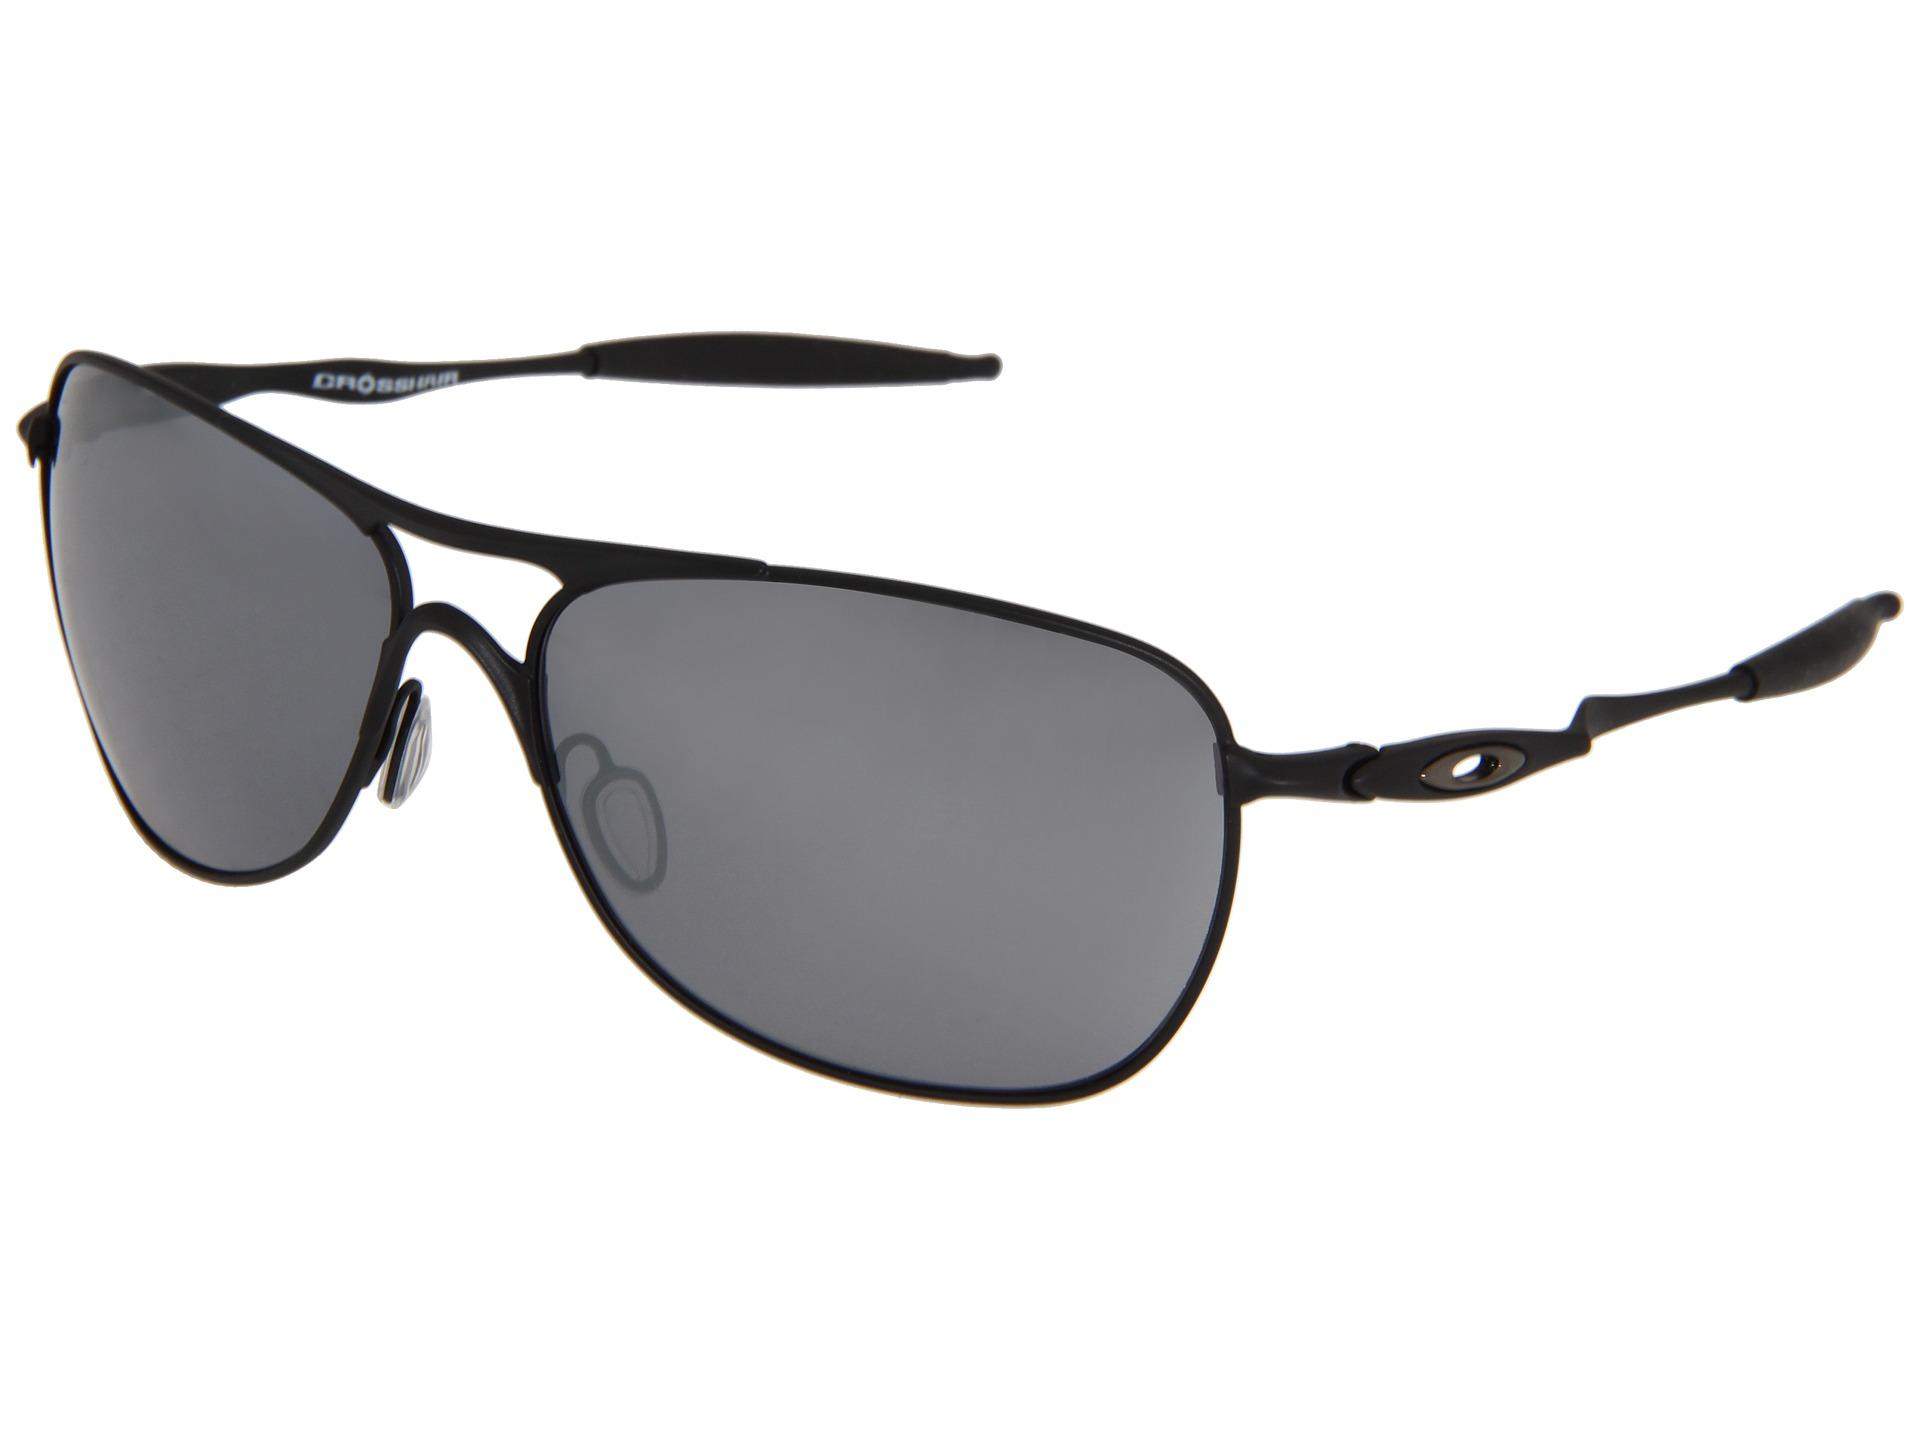 45940f95c9 Oculos Oakley Crosshair Replica « Heritage Malta